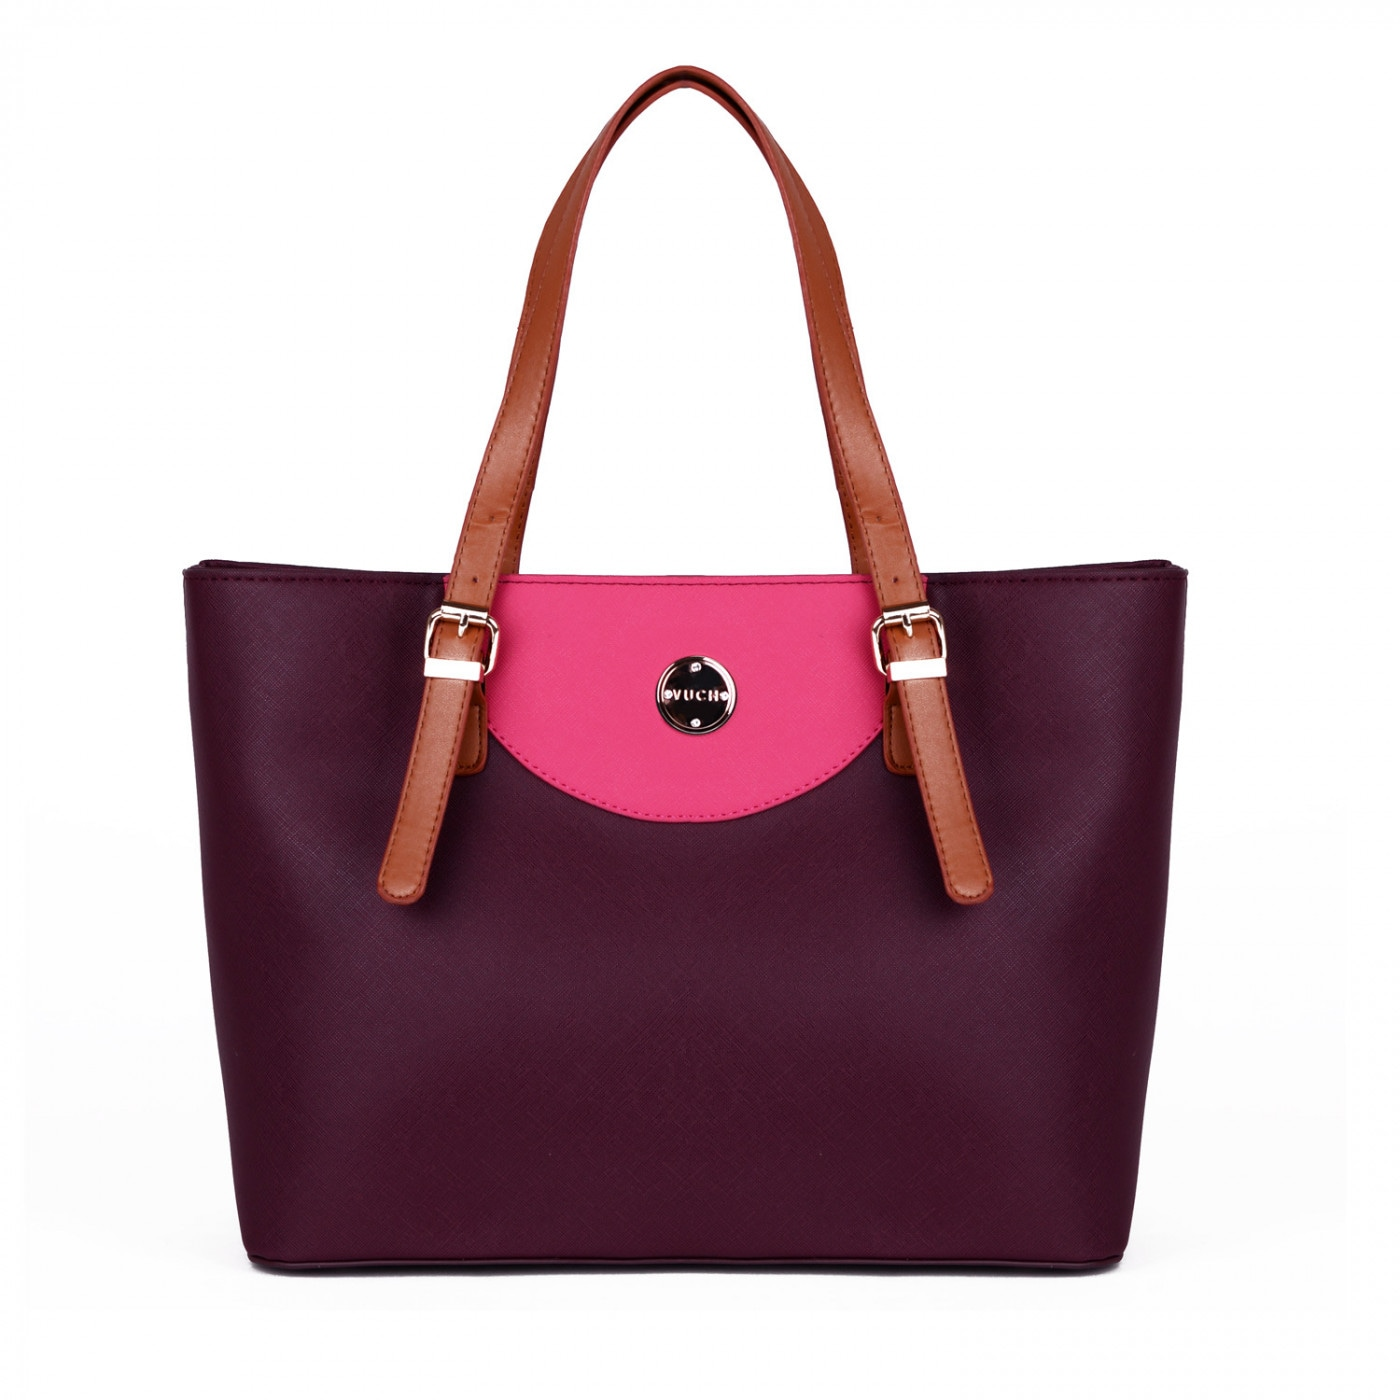 Women's Handbag VUCH Sense Collection